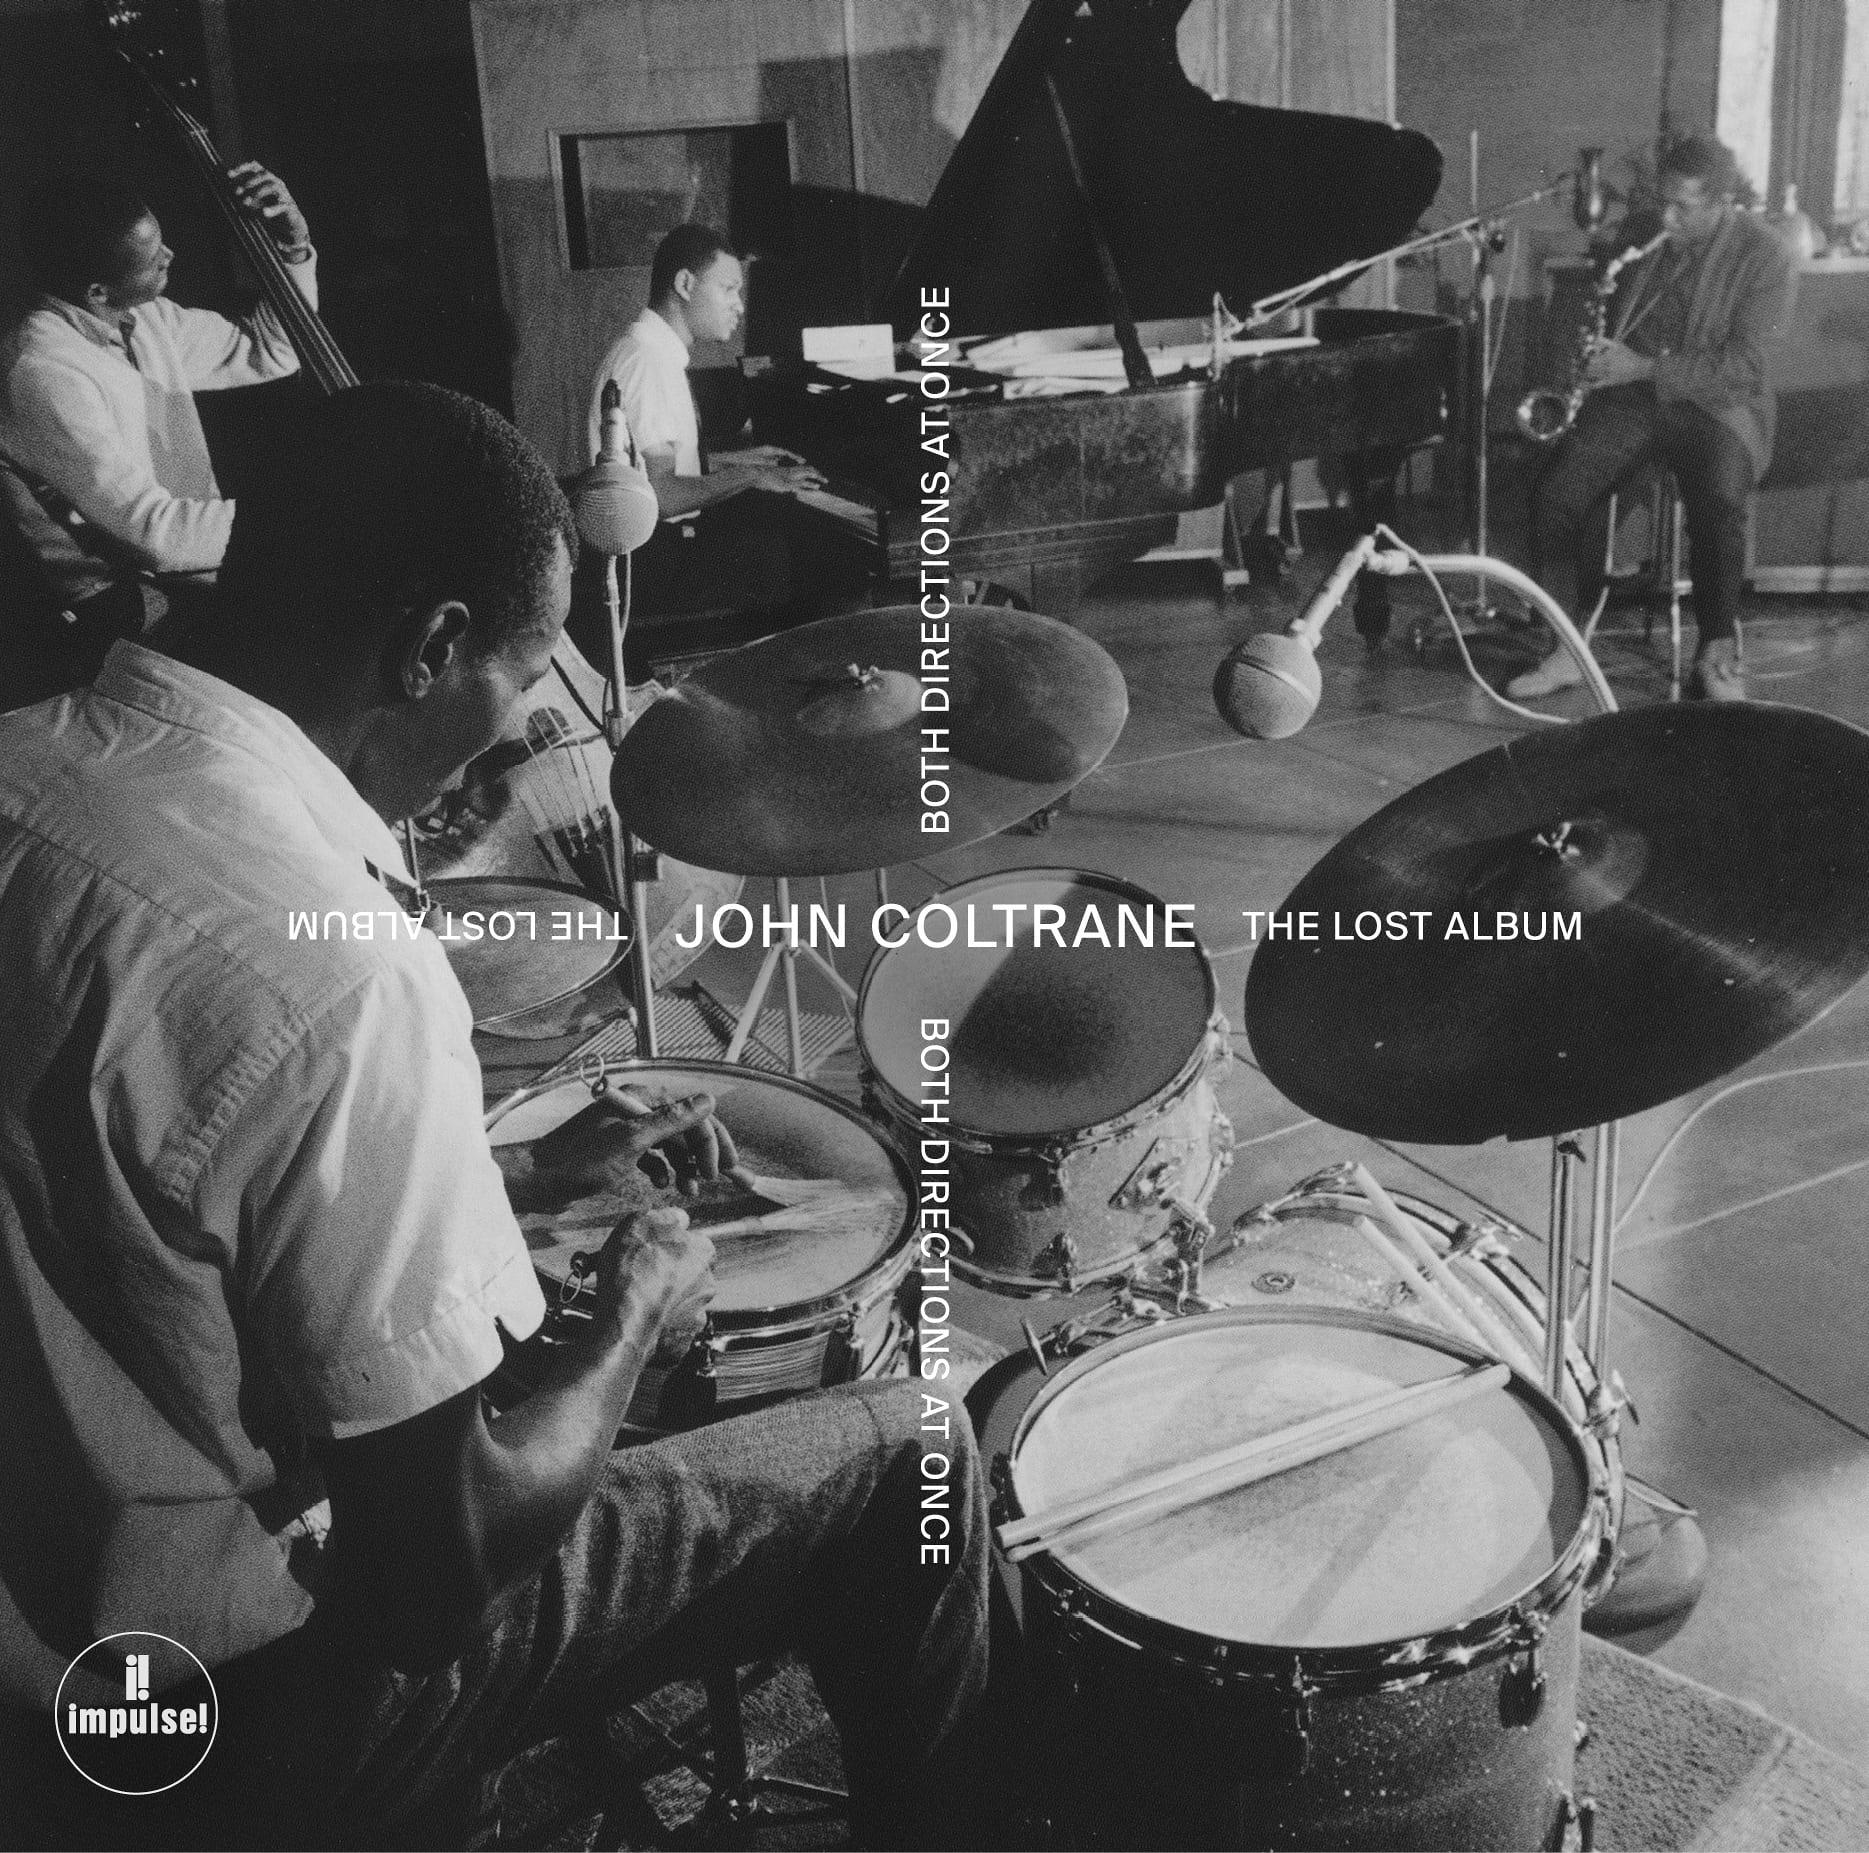 John Coltrane, novo álbum 186910